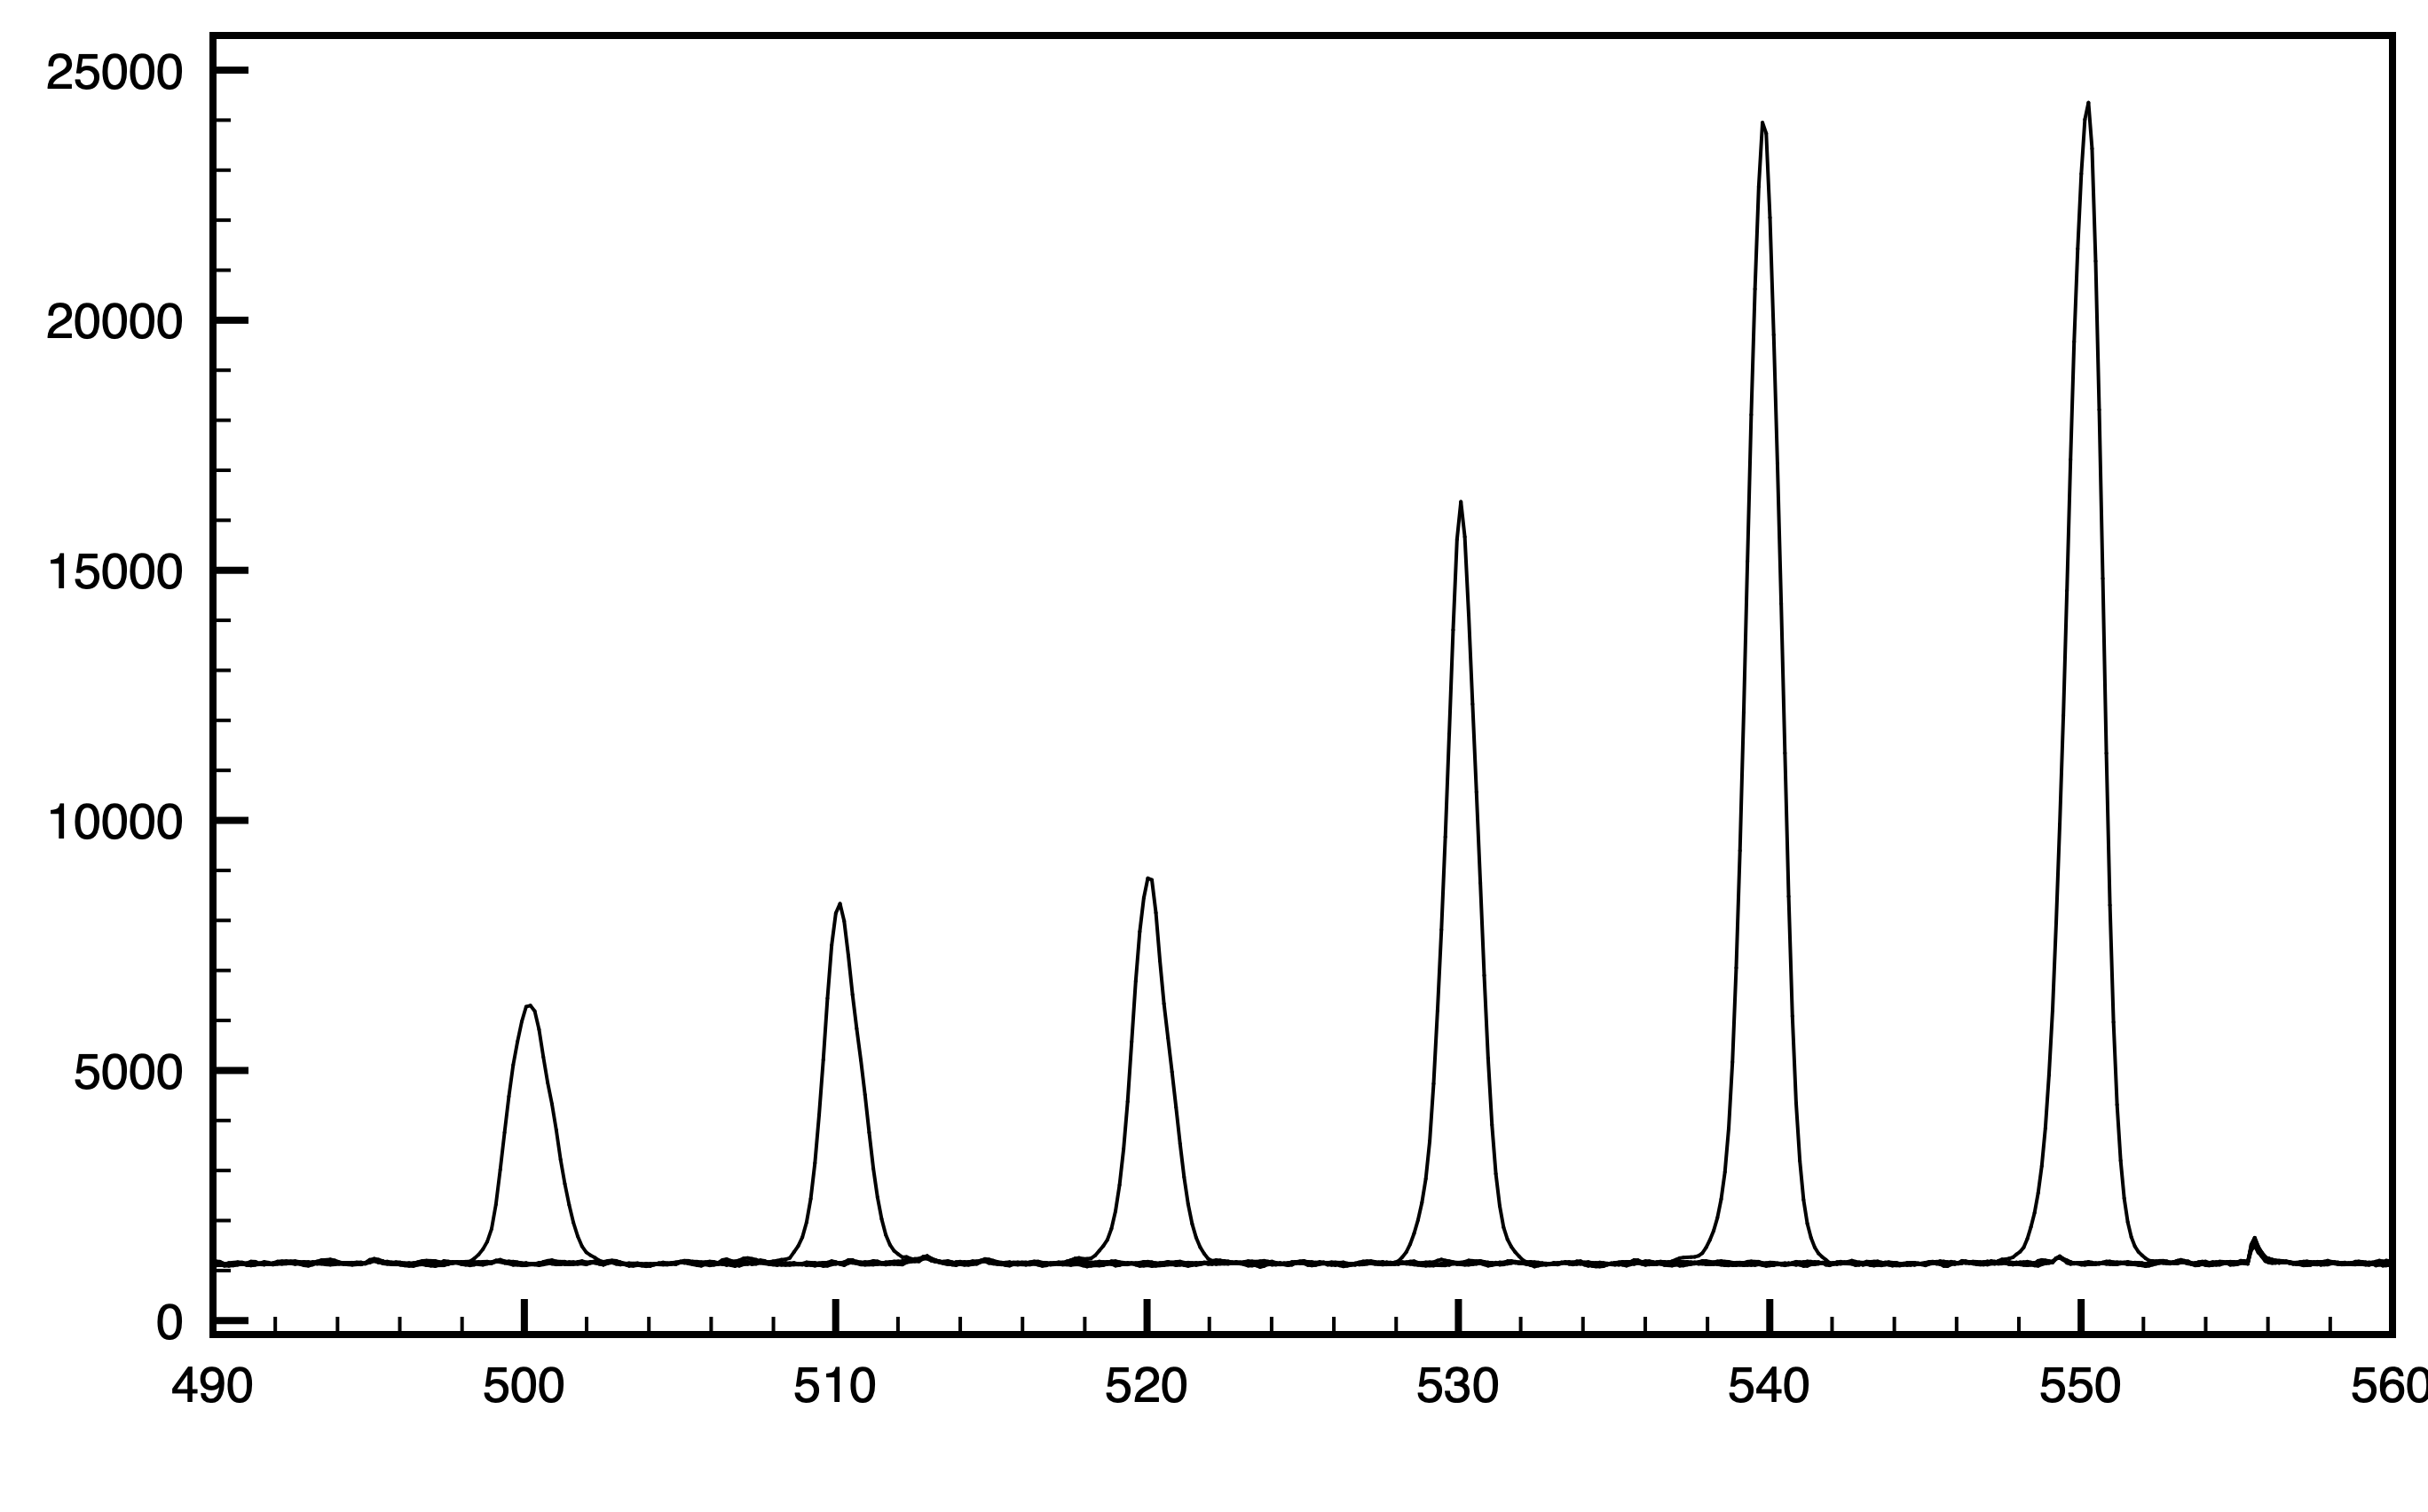 tbpf_20210217_test_plot.png